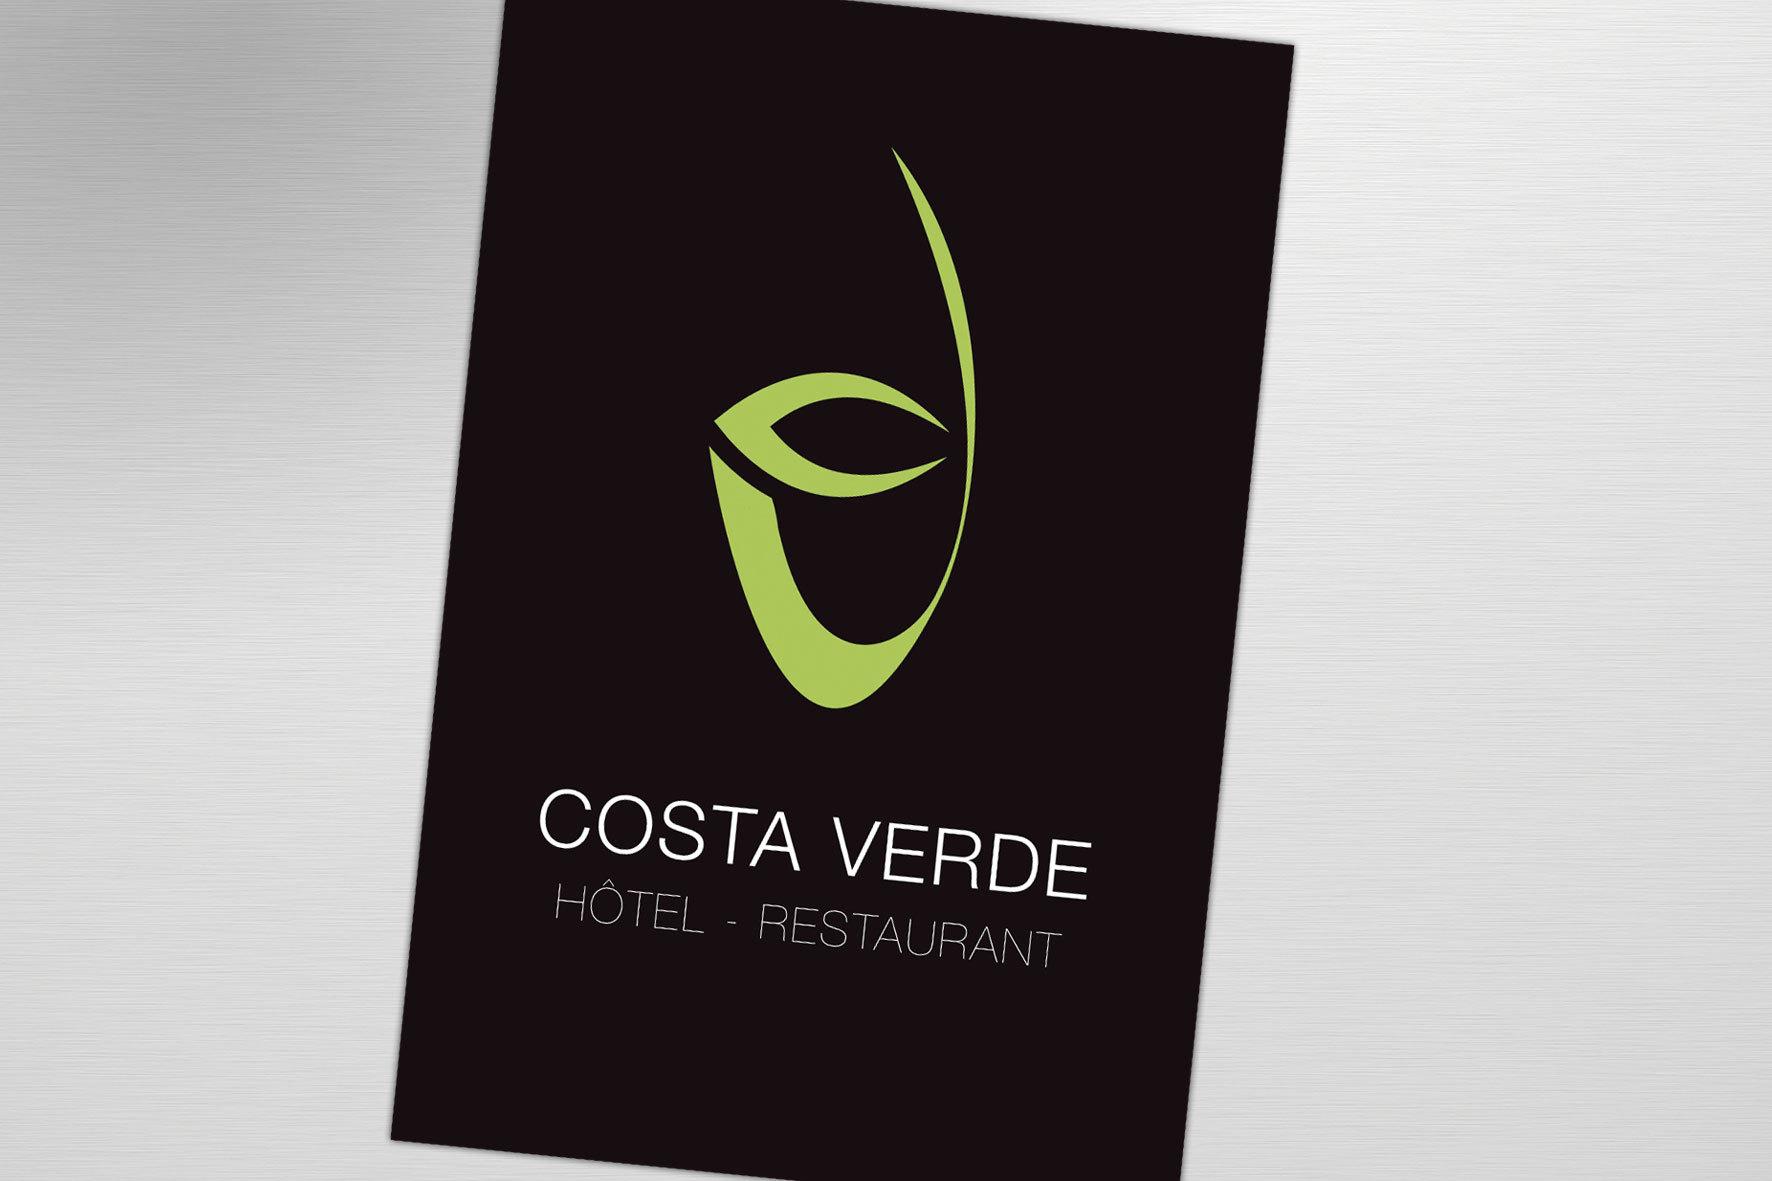 Hôtel Costa Verde